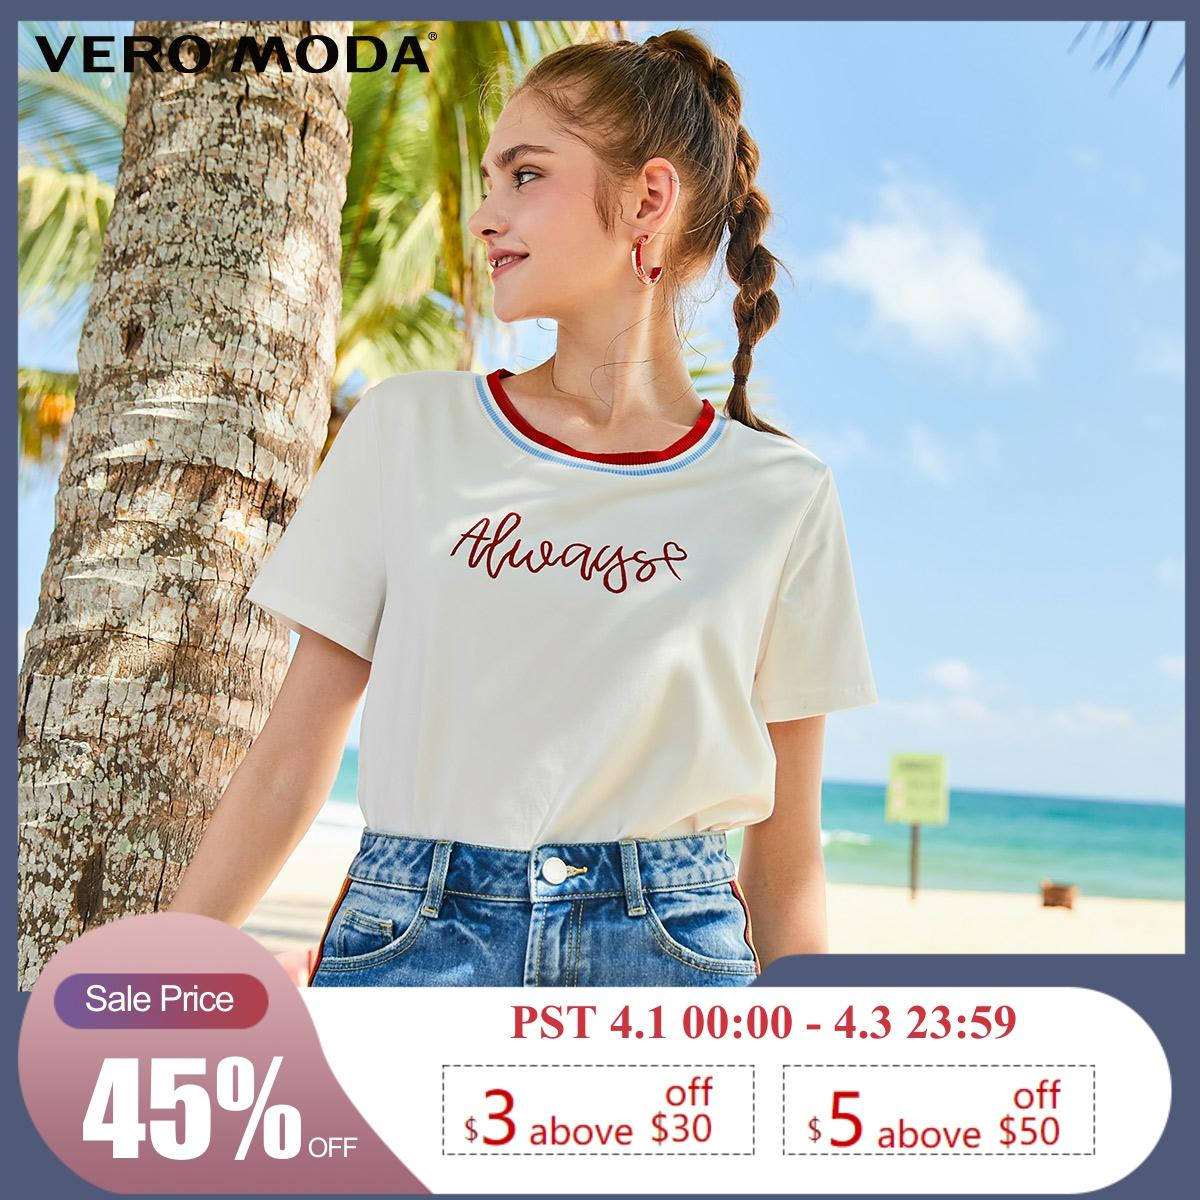 Vero Moda Women's Cotton Letter Print Round Neckline Assorted Colors Casul T-shirt | 319101505